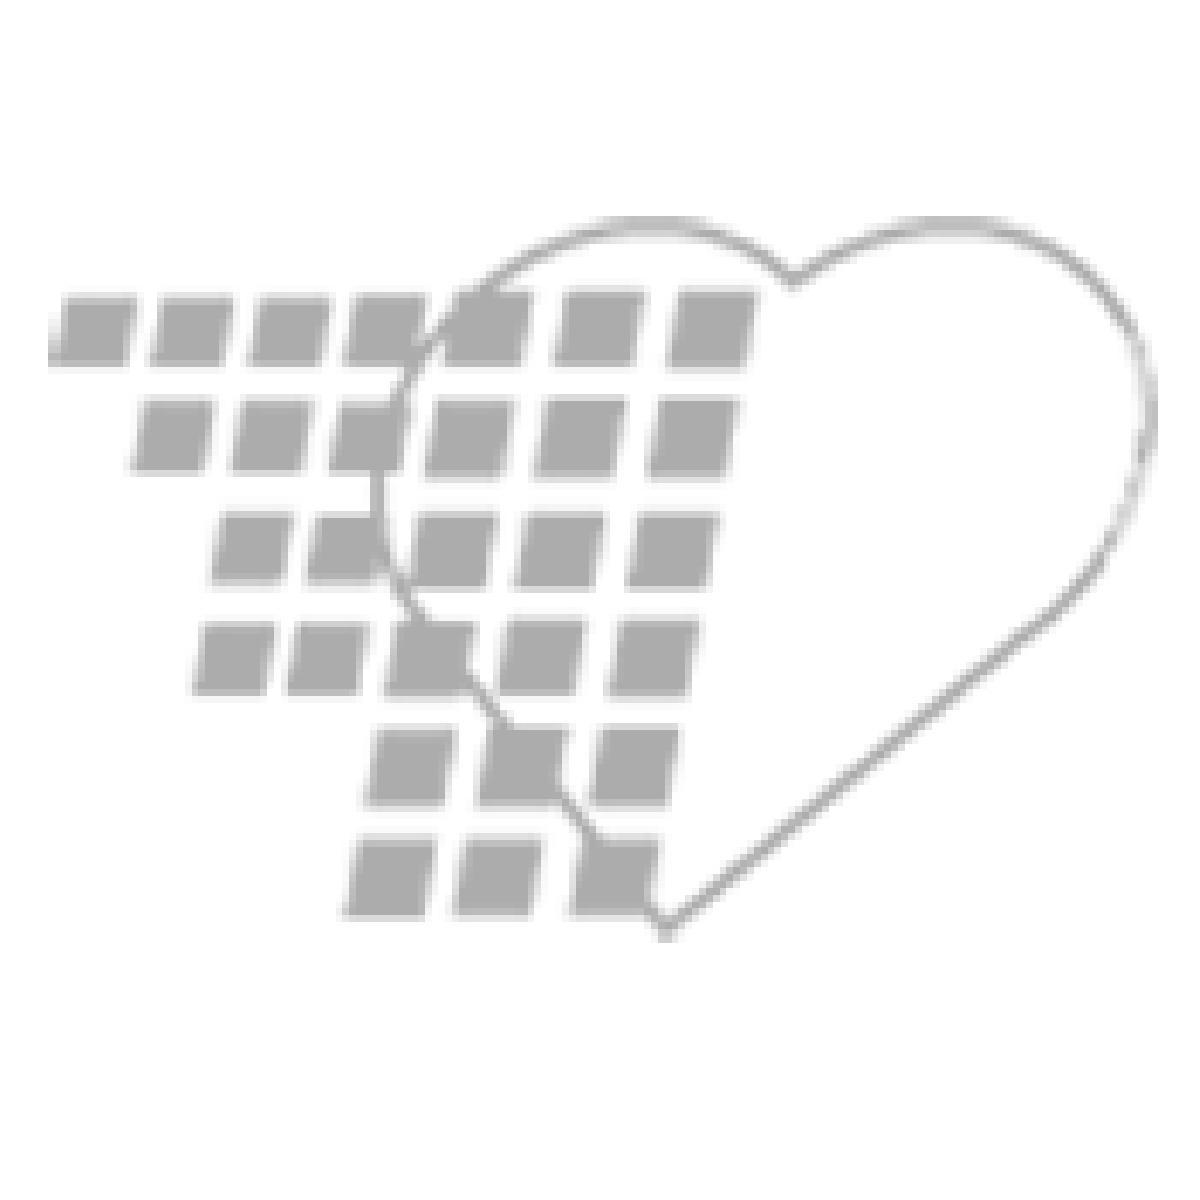 07-71-6430 Shiley Tracheostomy Tube with Disposable Inner Cannula